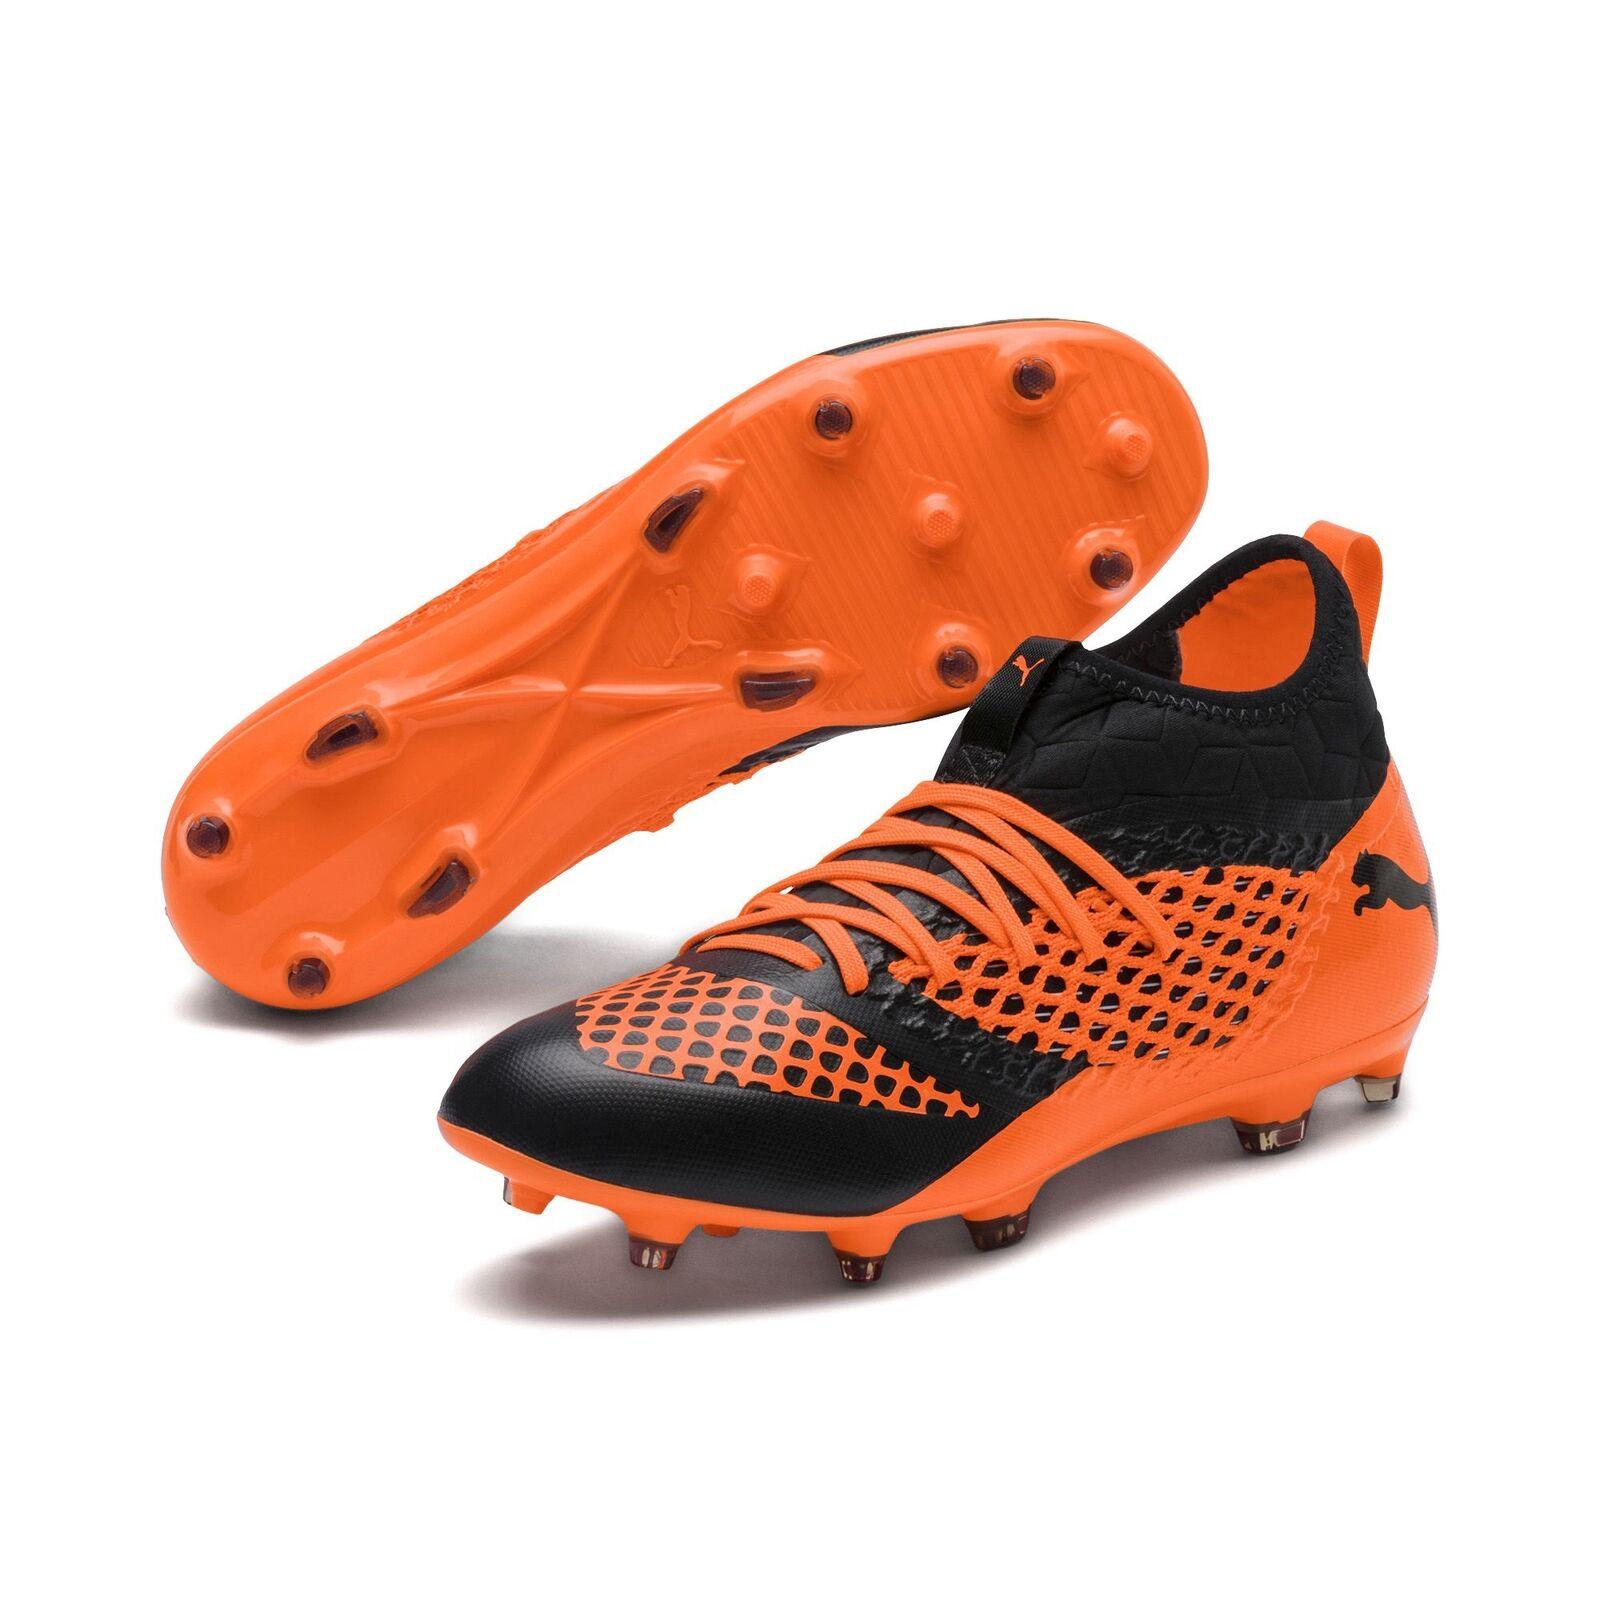 Puma Junior Future 2.3 Netfit Firm Firm Firm Ground Football Stiefel c64a52